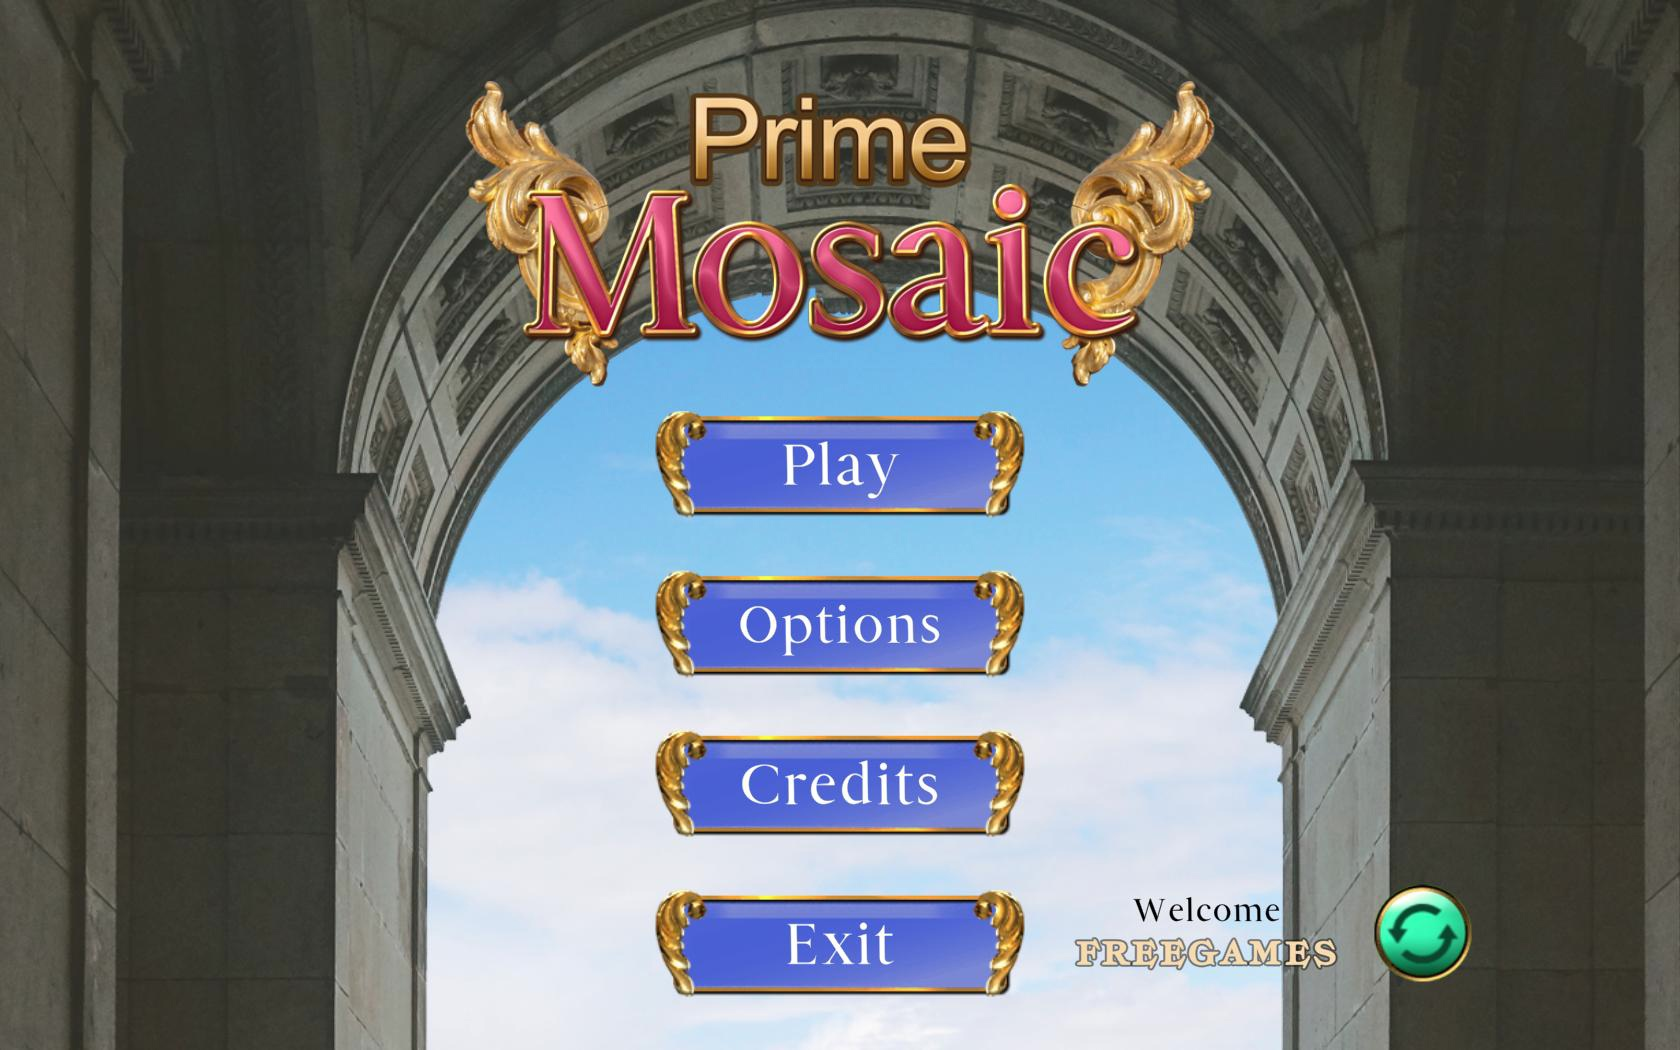 Prime Mosaic (En)